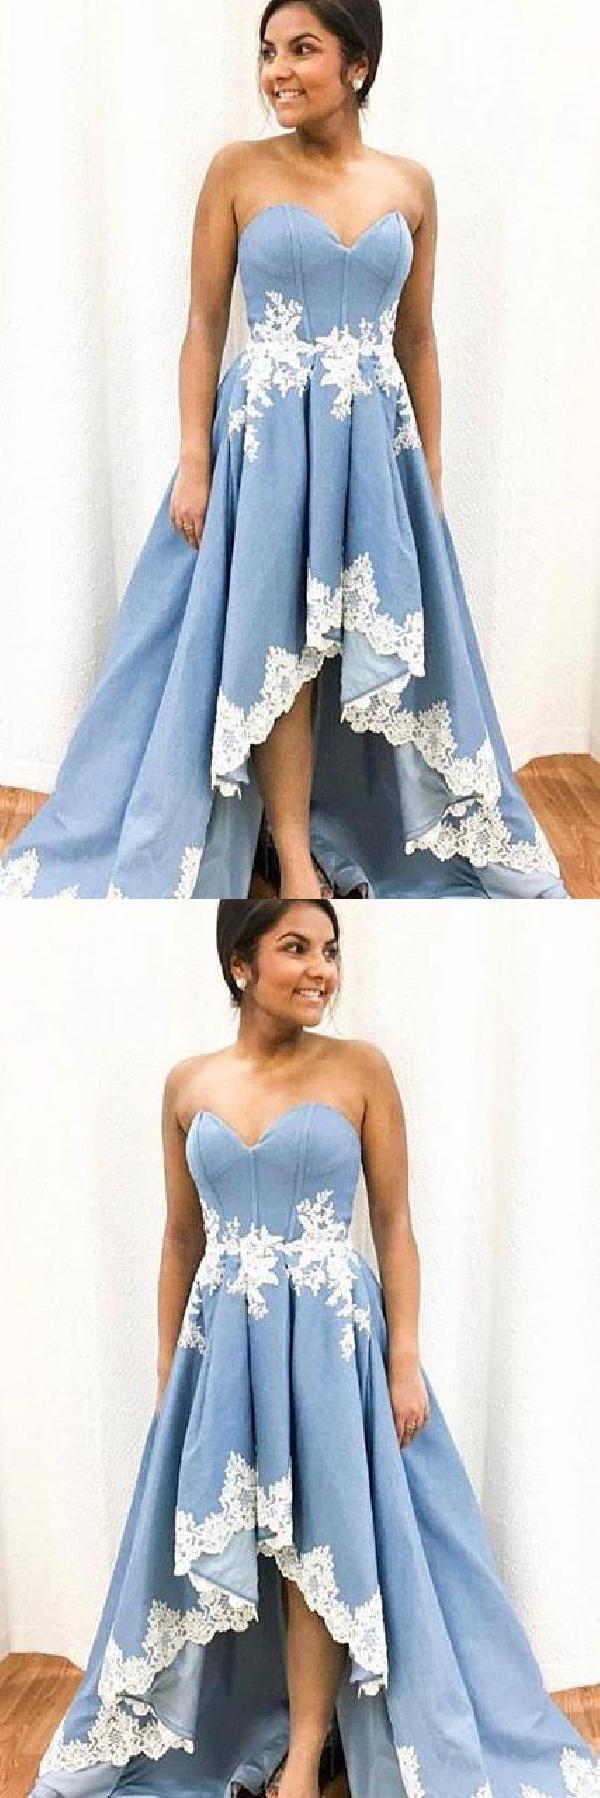 Lace White Prom Dress #LaceWhitePromDress, White Prom Dress #WhitePromDress, Pro…